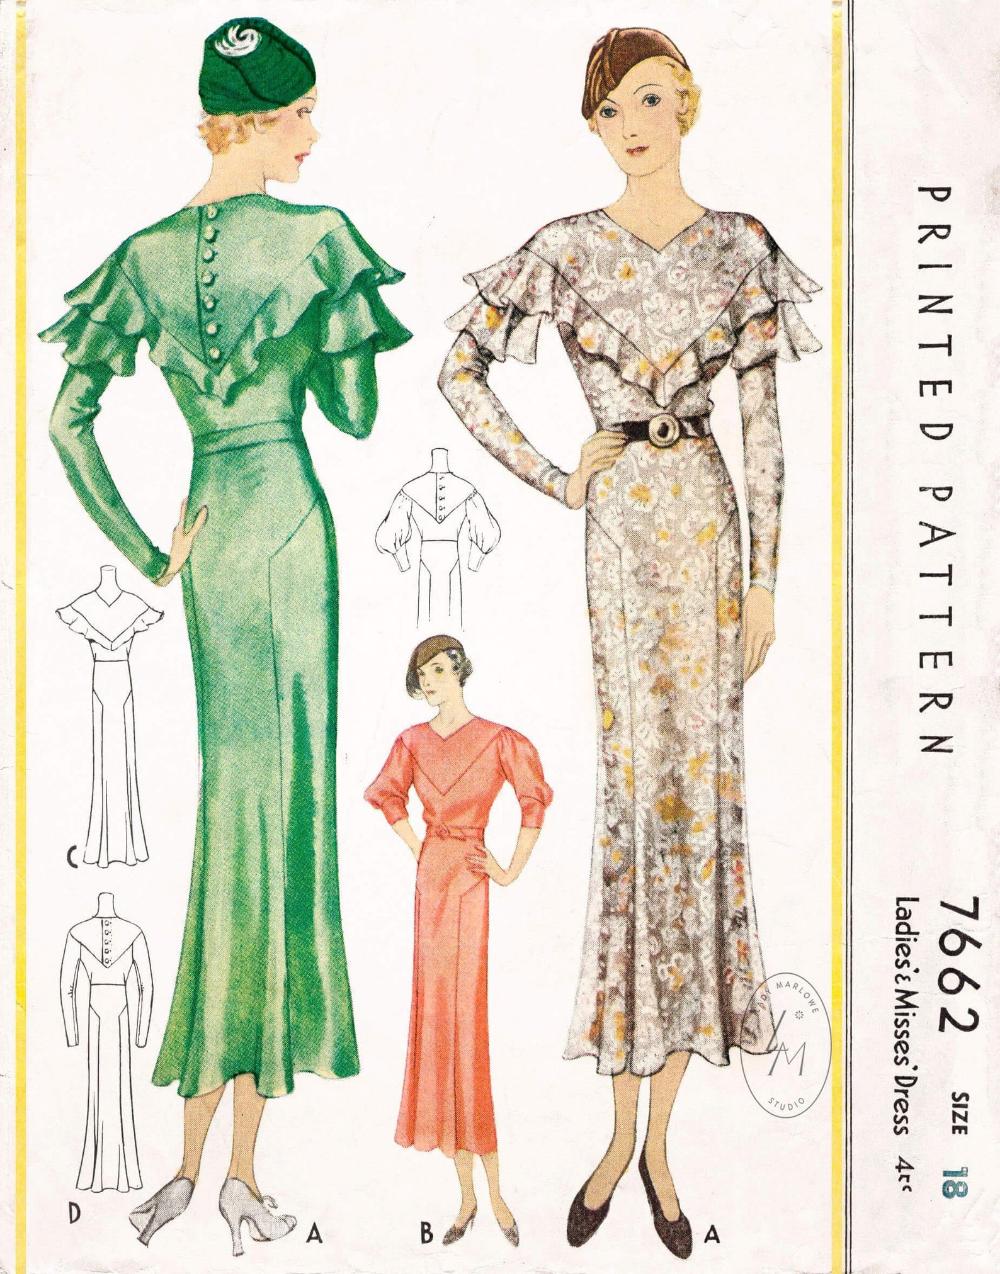 1930s Vintage Sewing Pattern Reproduction 30s Dress Sleeves Etsy Vintage Sewing Patterns Evening Gown Pattern Vintage 20s Dresses